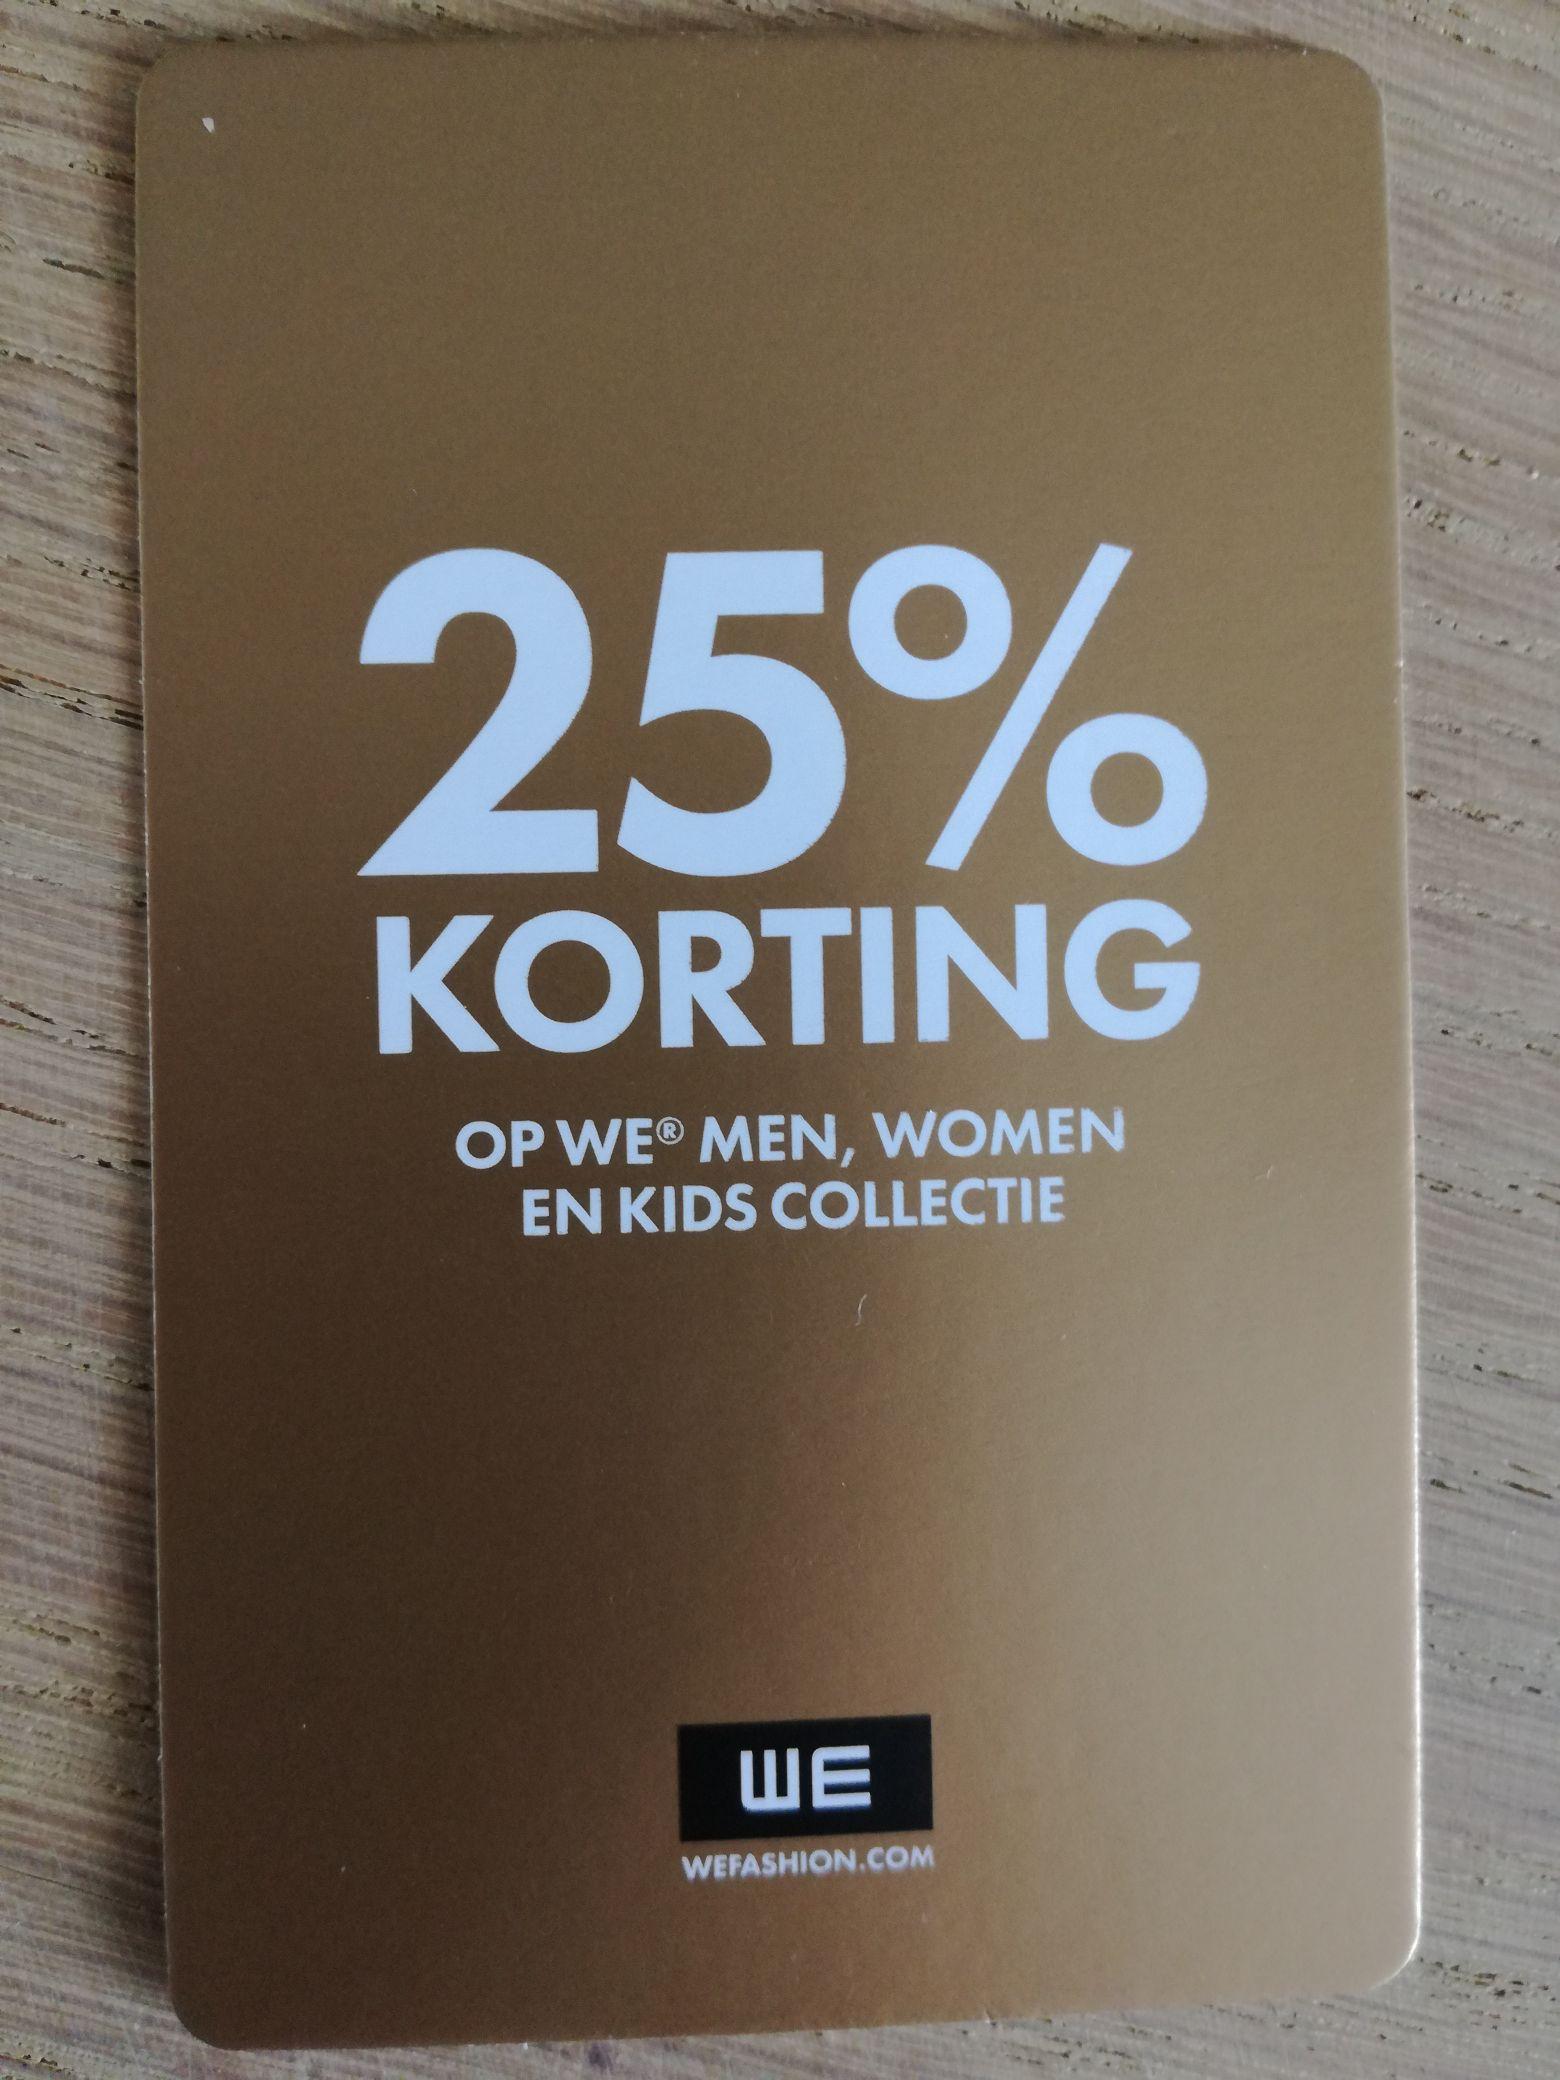 WE fashion. 25% korting op één artikel naar keuze, 2 codes